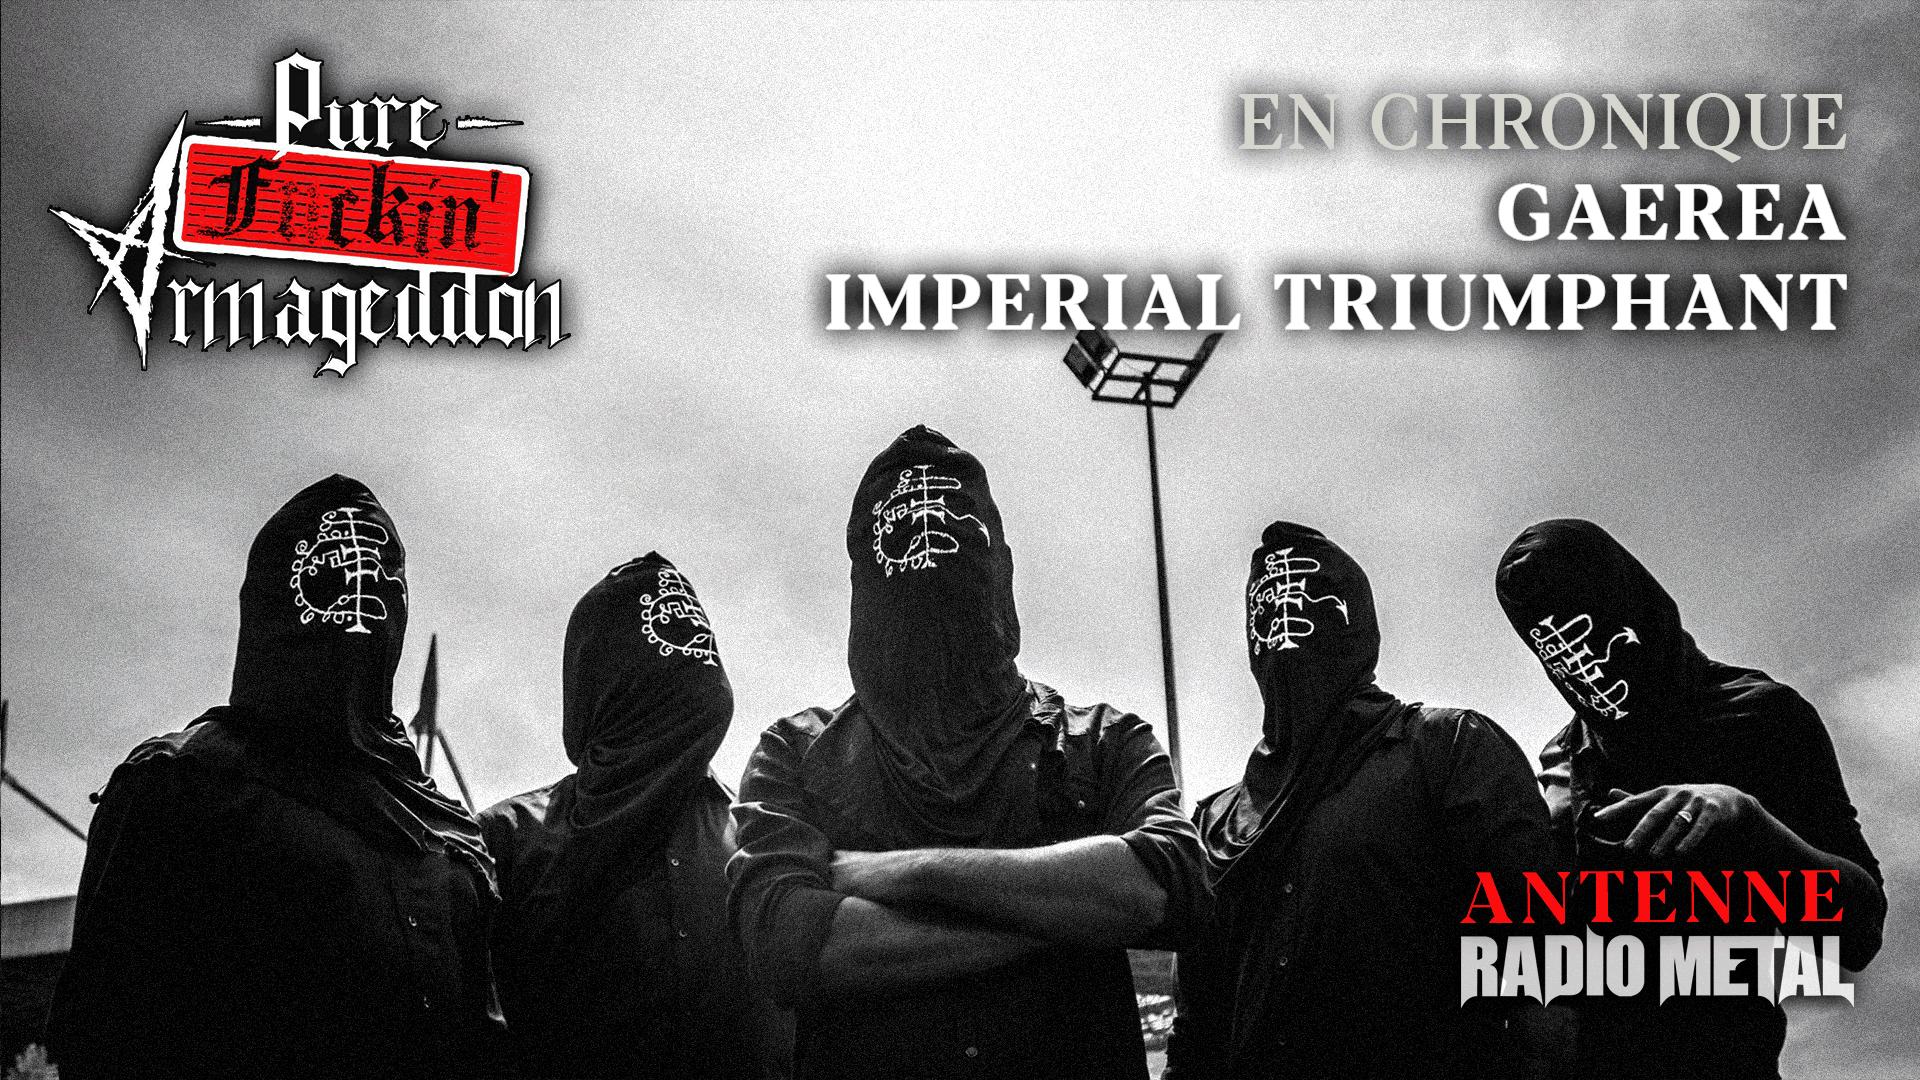 Pure Fuckin' Armageddon Gaerea Imperial Triumphant